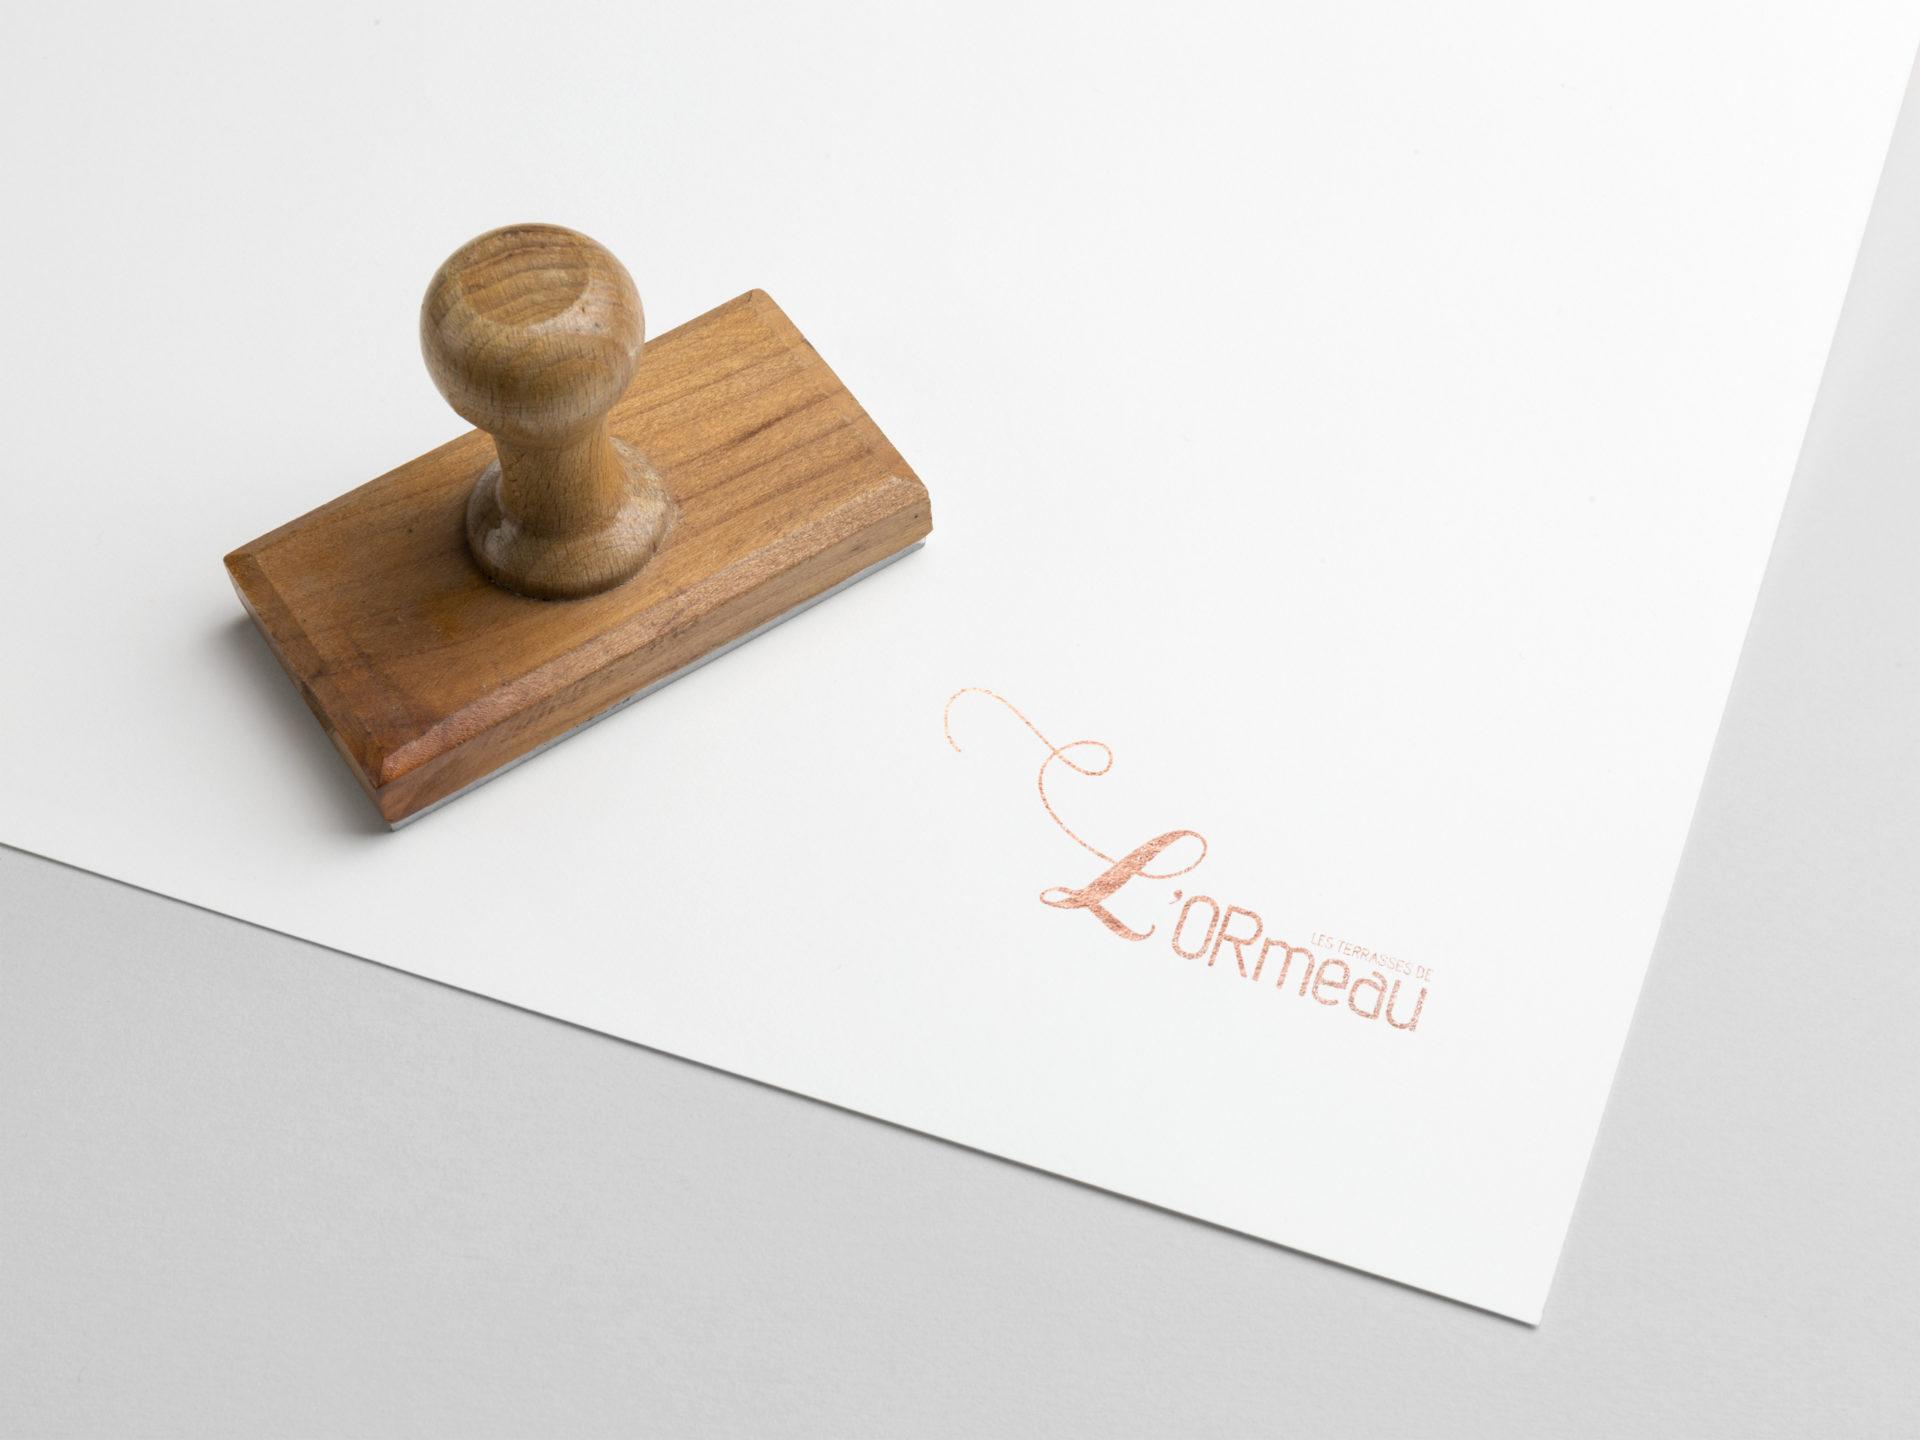 identite-visuelle-logo-professionnel-haut-de-gamme-calligraphie